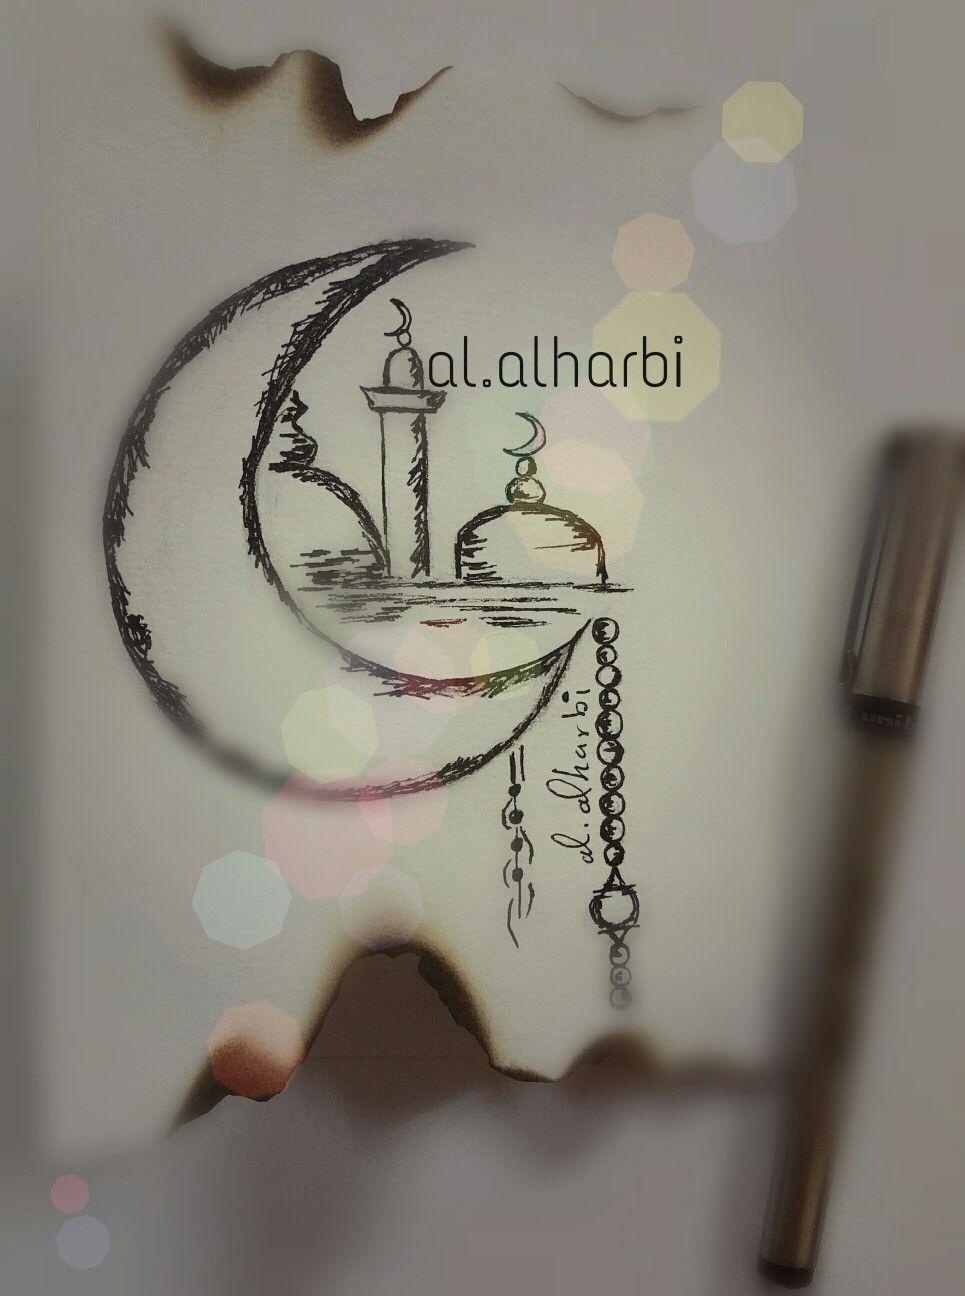 عيد أضحى مبارك حبيبي Me Al Alharbi Home Decor Decals Decor Creative